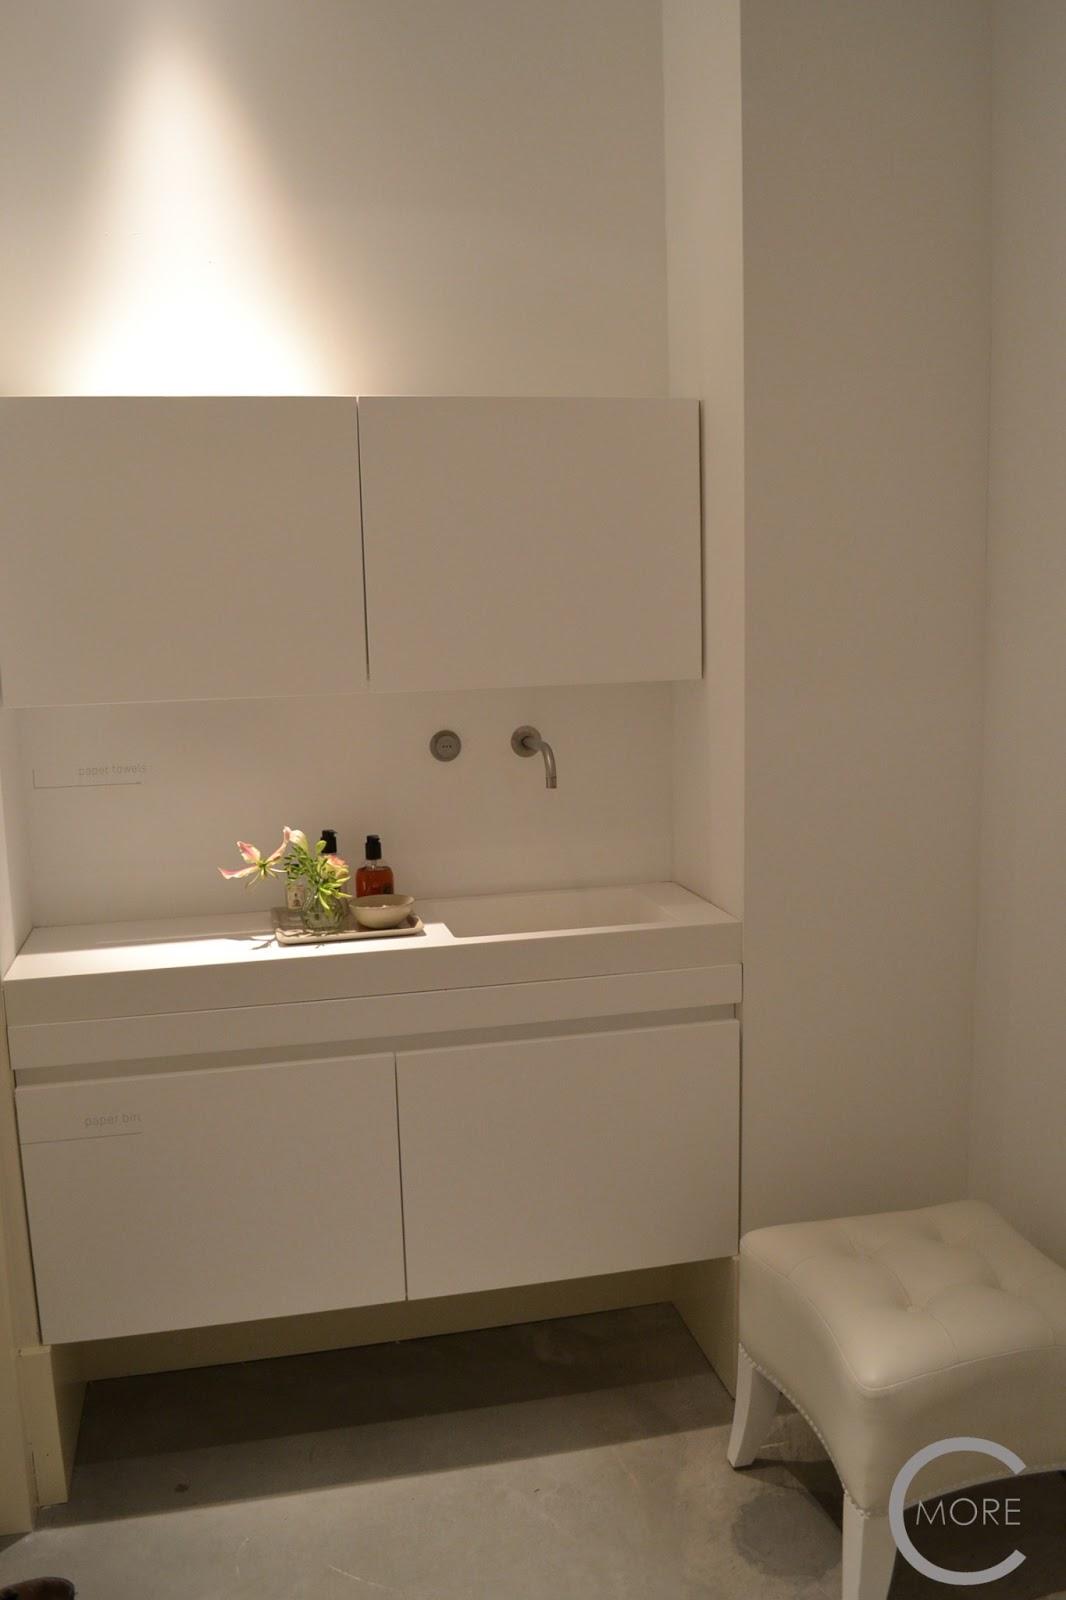 C more interieuradvies blog interior and design blog piet for Decoration interieur blog